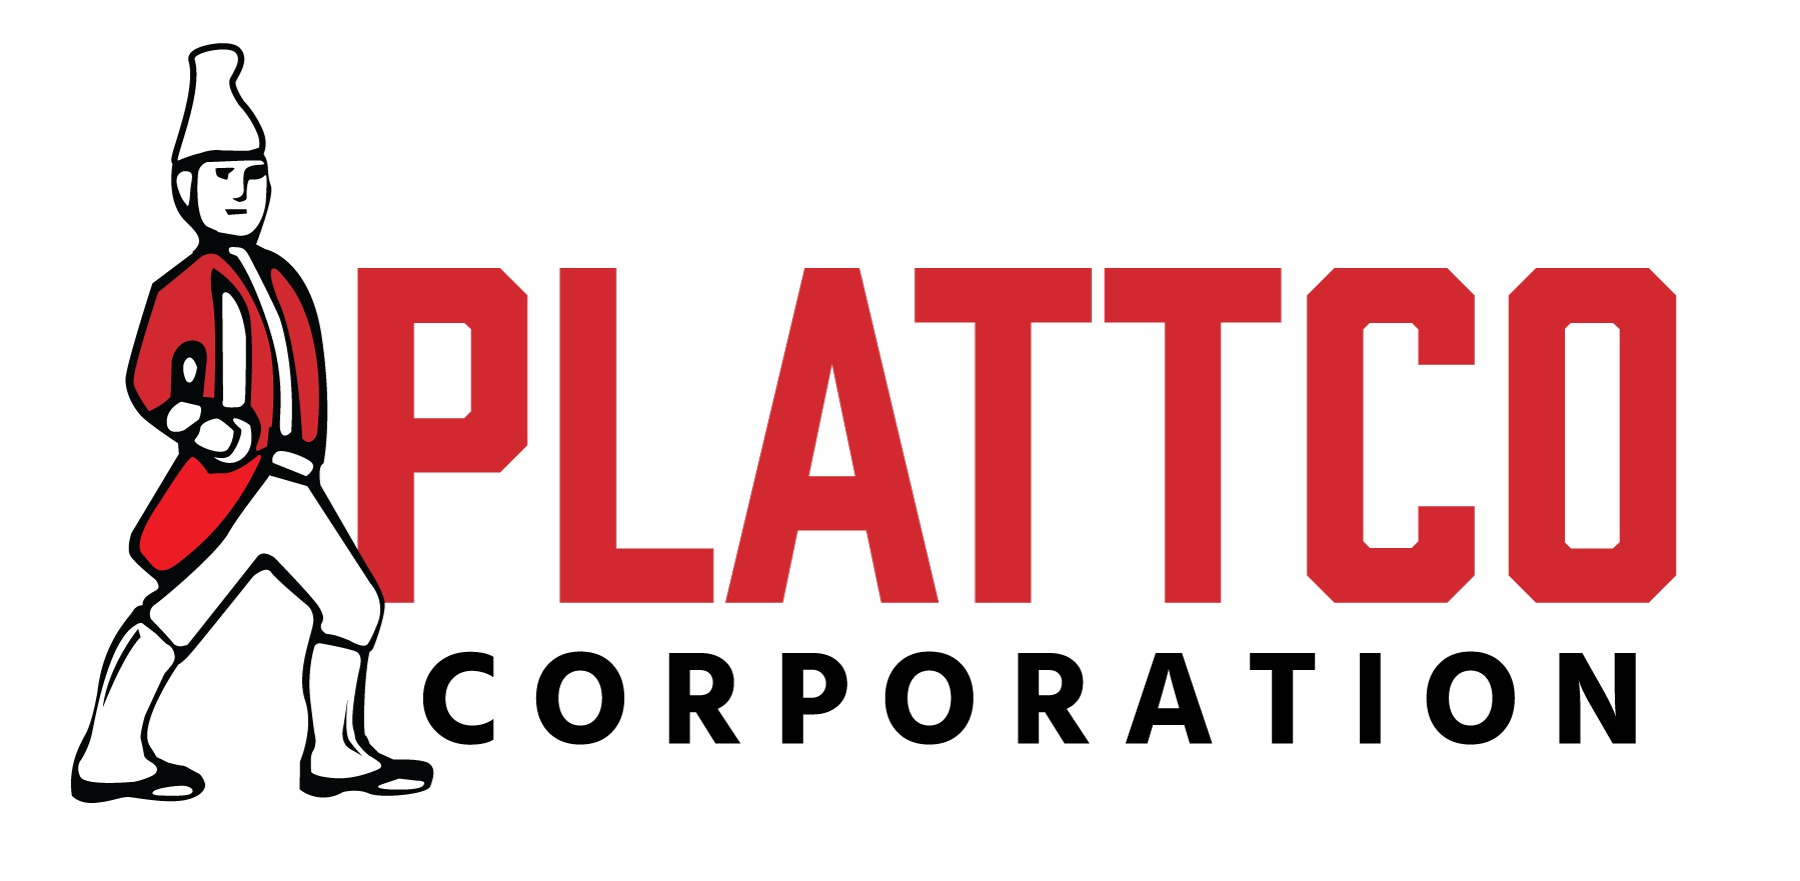 Plattco Corporatoin Logo